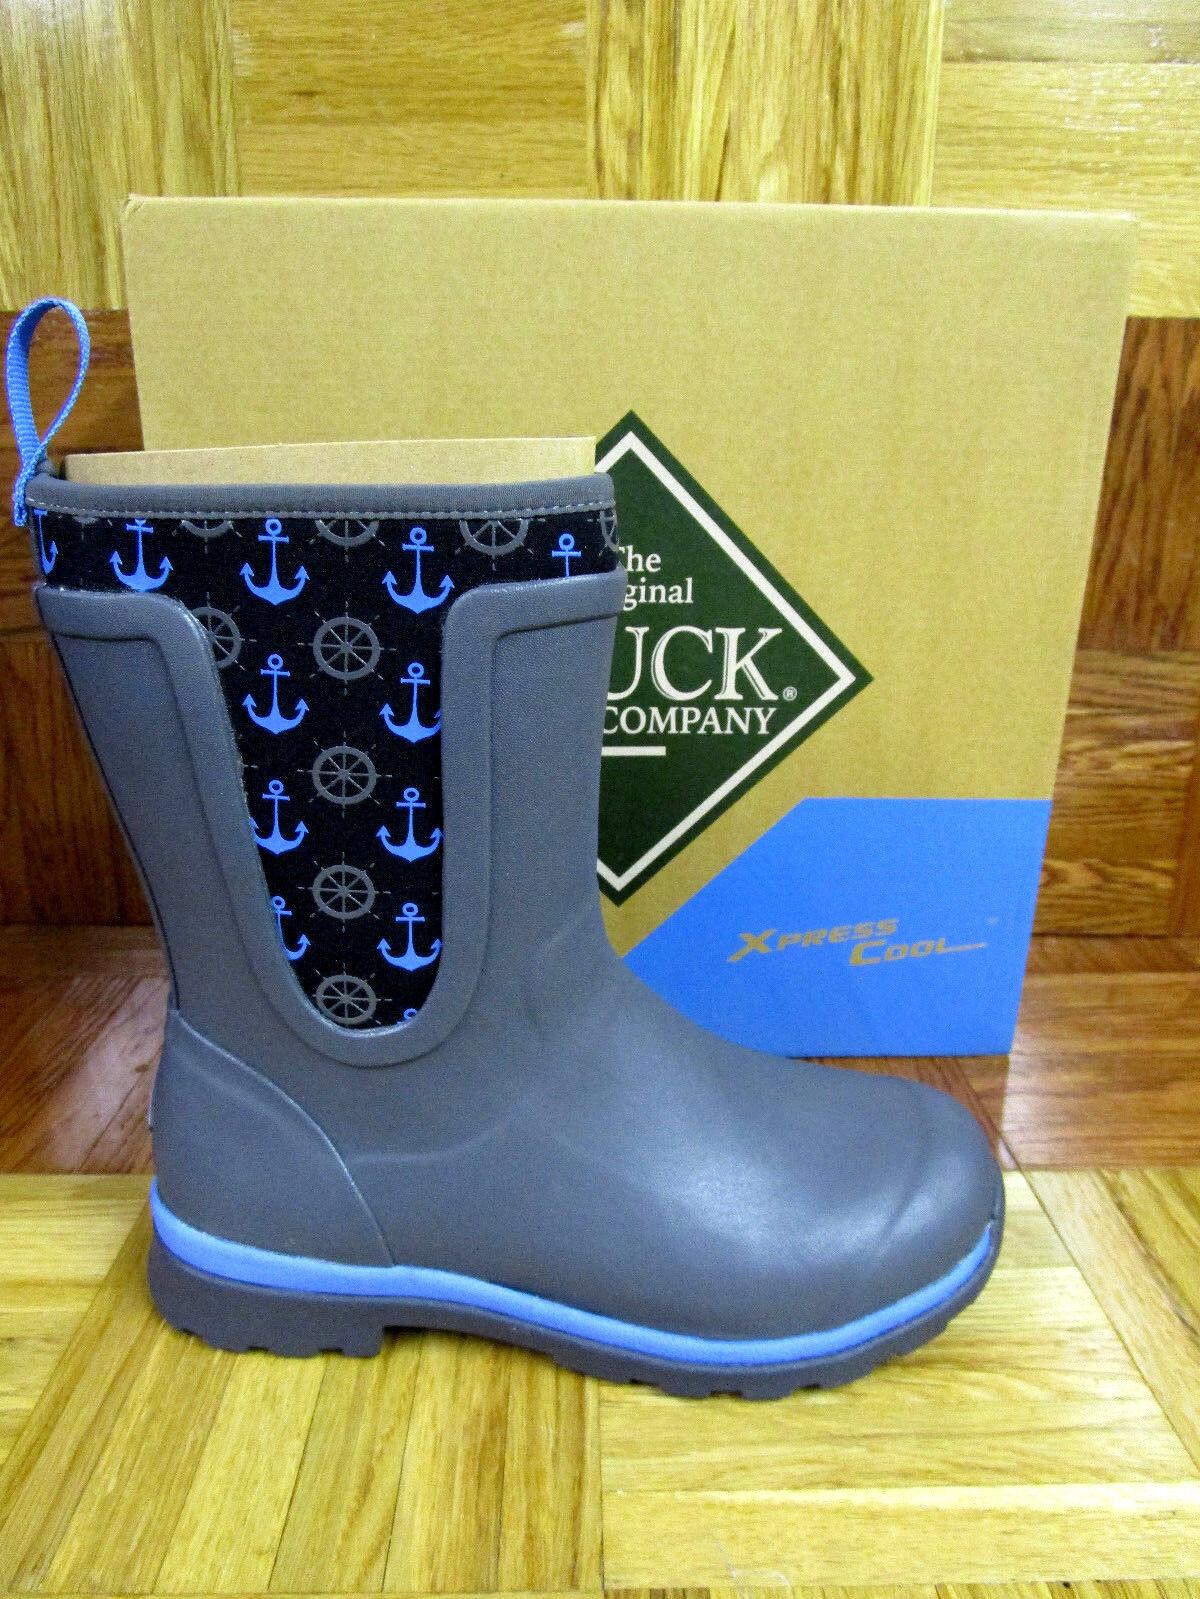 mas preferencial Muck botas para Mujer Cambridge Mid Premium botas De Lluvia Lluvia Lluvia gris Azul anclas  precio mas barato